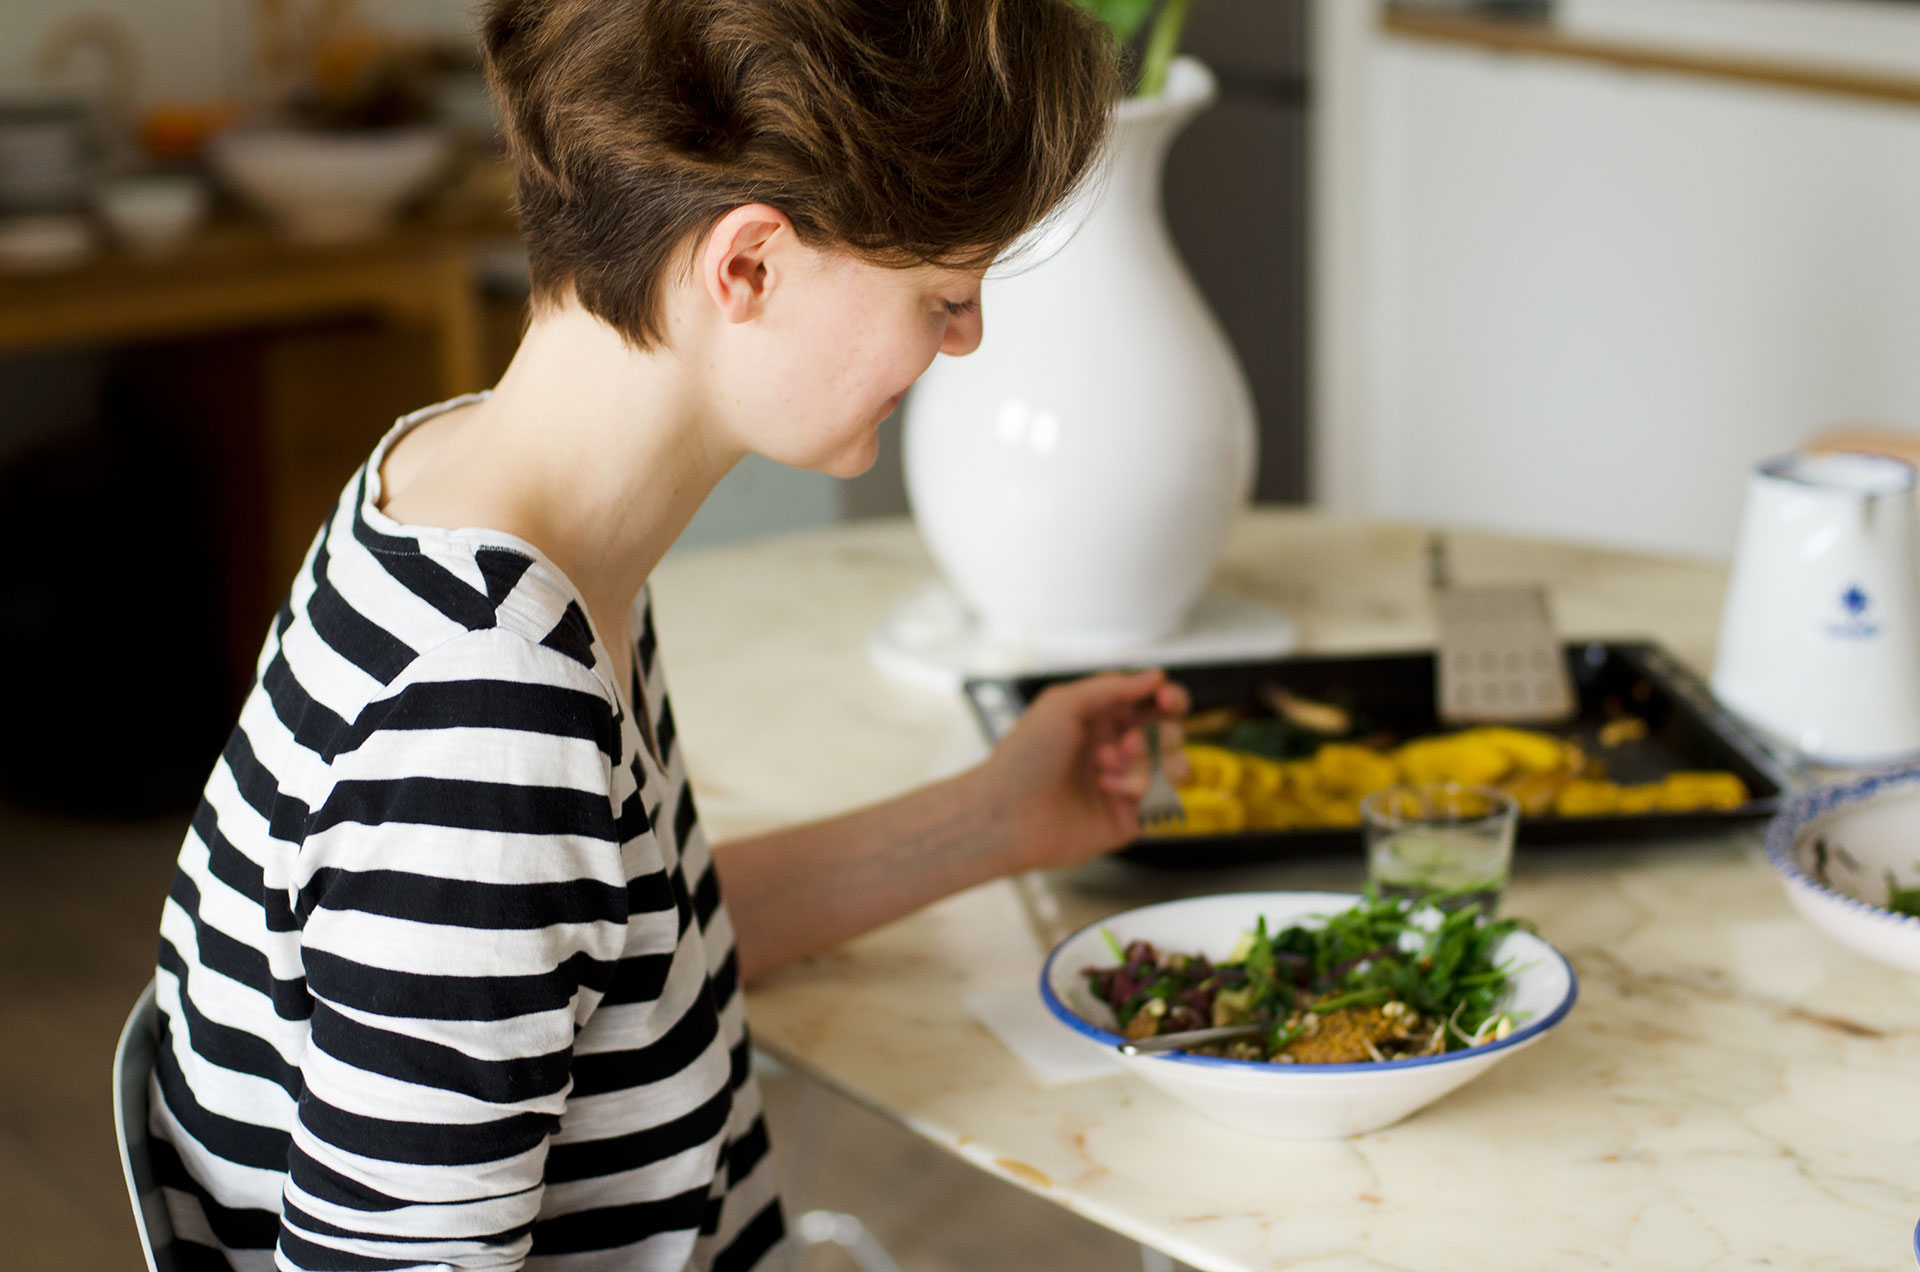 Nele Heinemann enjoying Alanna Lawley's Portobello Booster Bowl recipe for supporting an underactive thyroid.